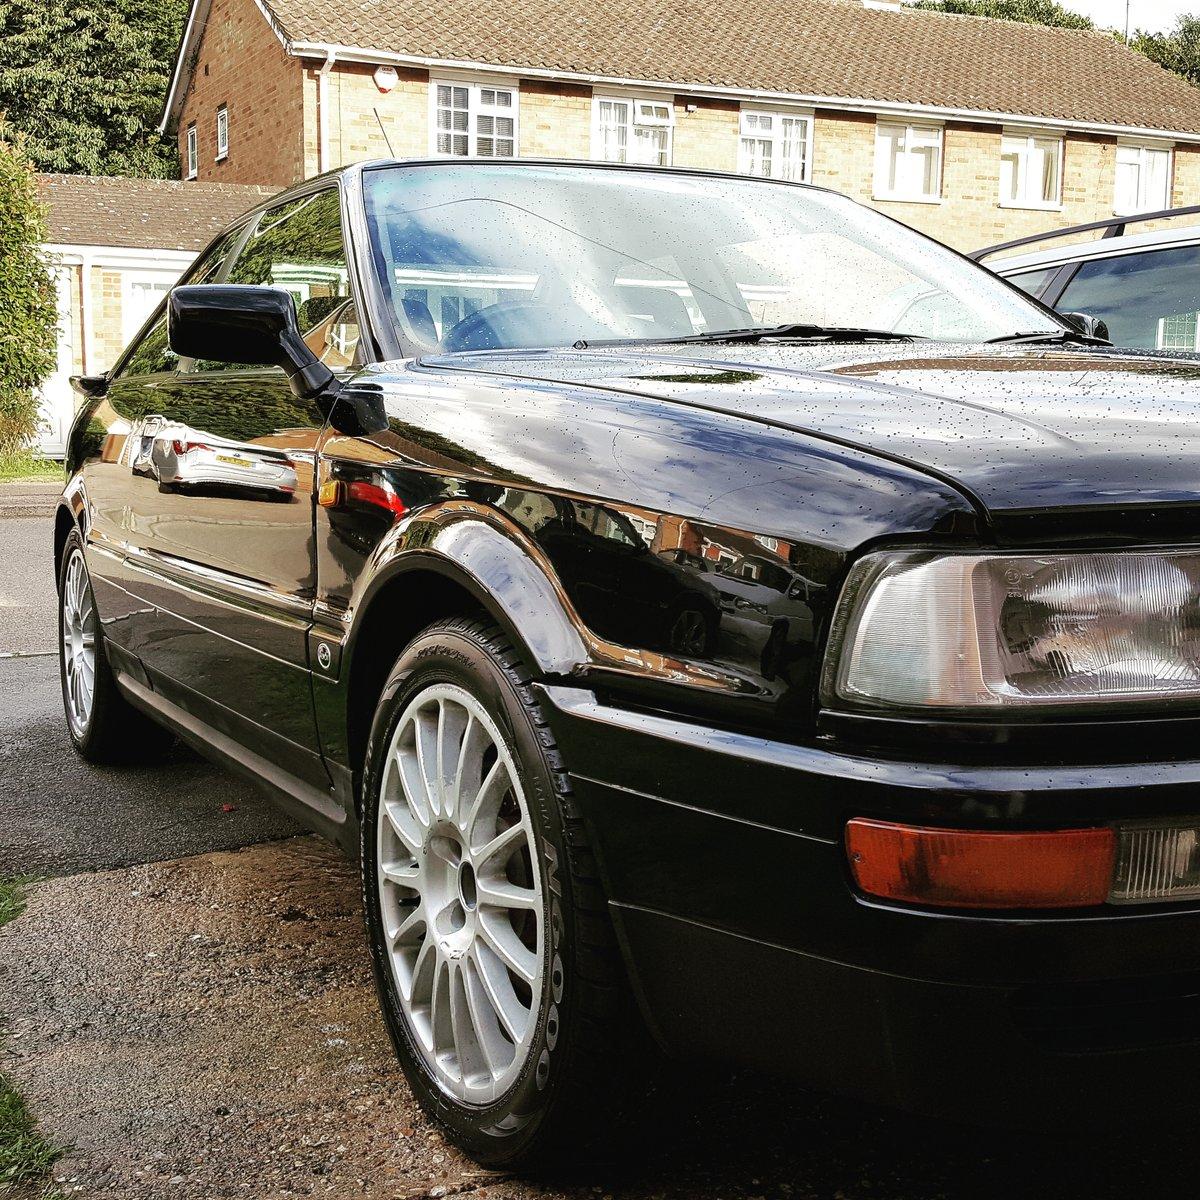 1990 audi coupe quattro 2.3 20v For Sale (picture 1 of 6)